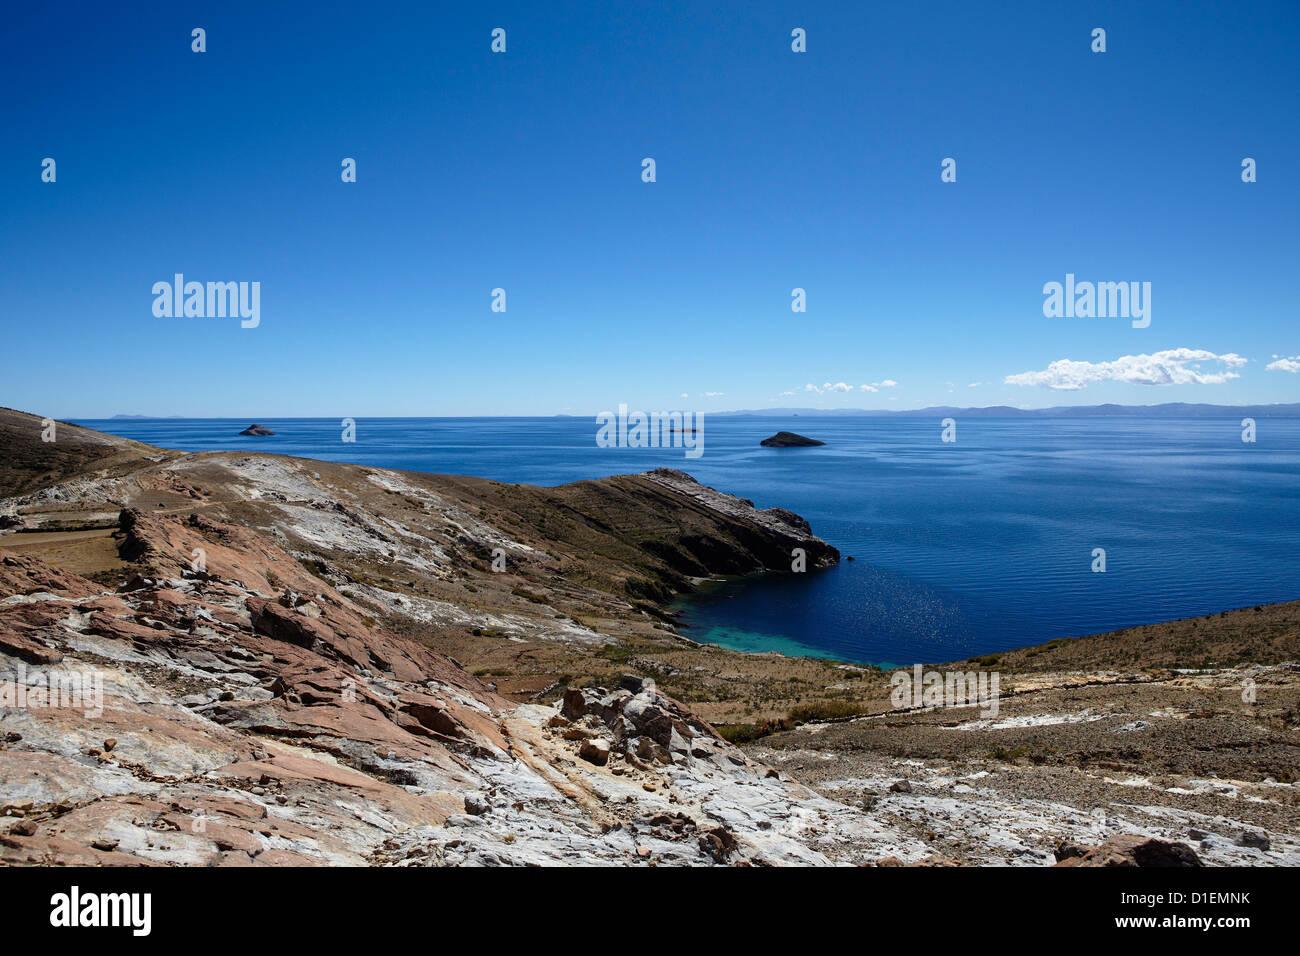 Titicacasee, Bolivia, South America, America - Stock Image